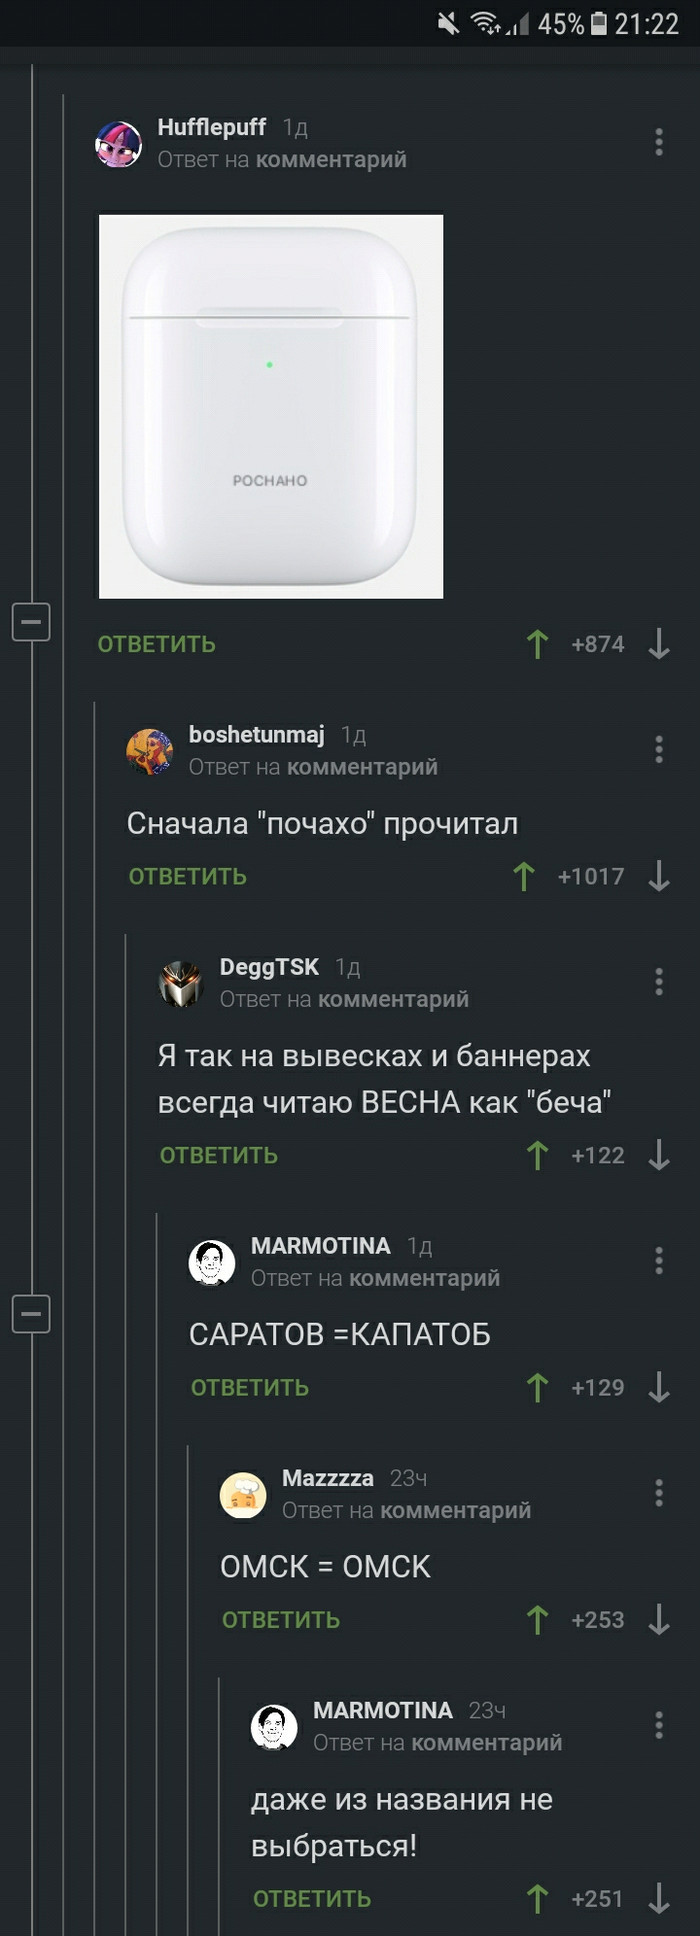 ОМСК=ОМСК Скриншот, Комментарии на Пикабу, Омск, Длиннопост